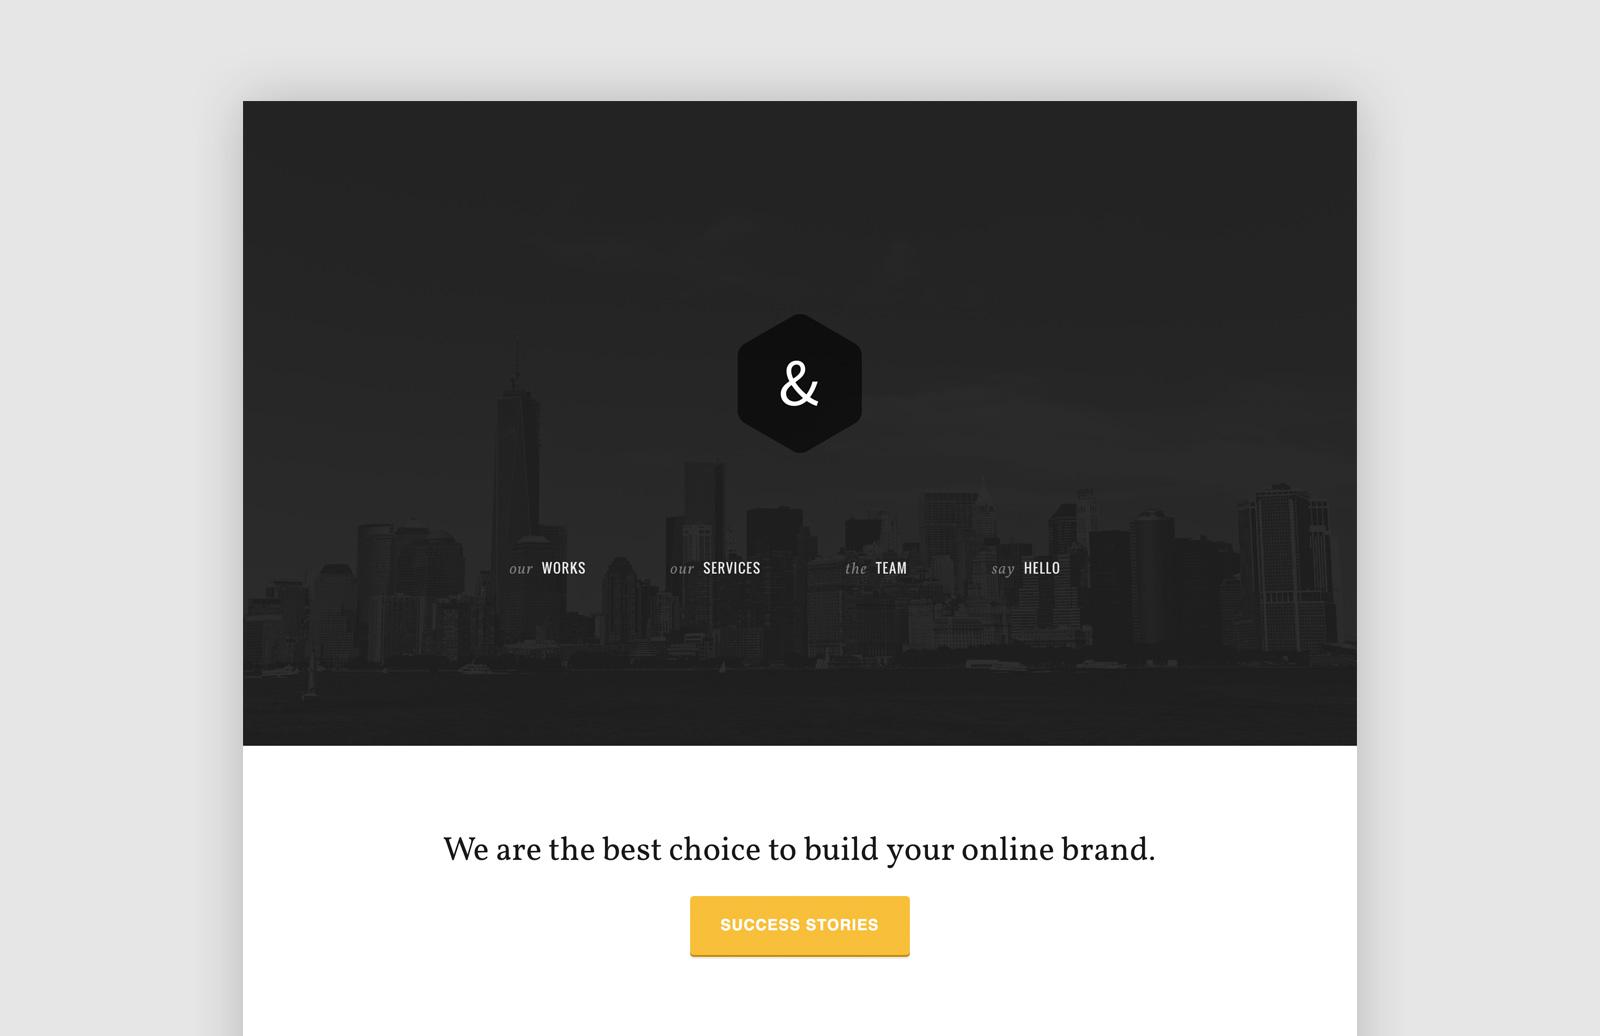 AmpPortfolio - Responsive HTML5/CSS3 theme for agencies 1